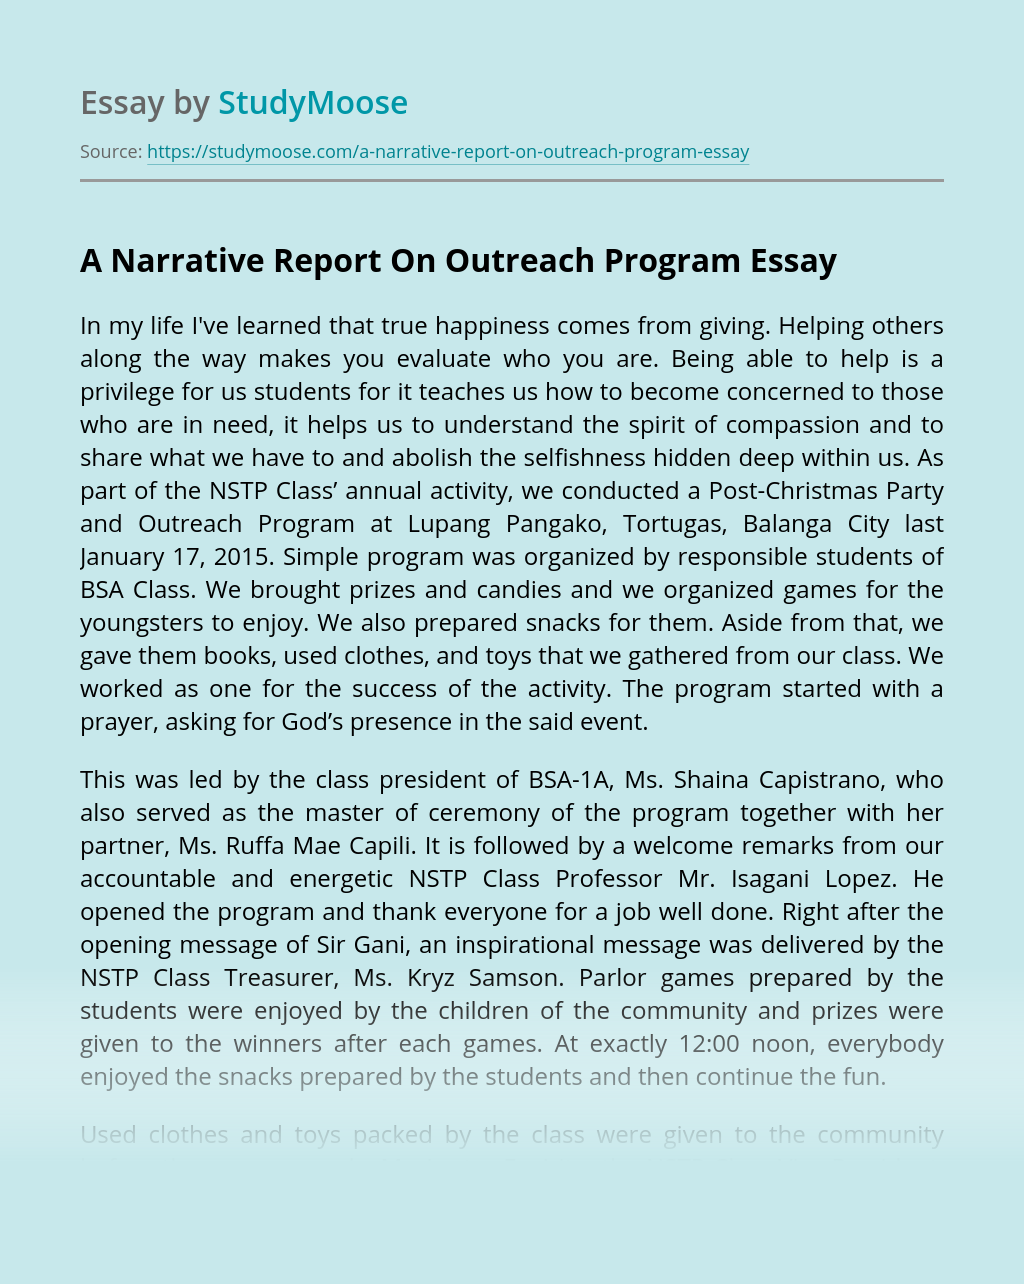 A Narrative Report On Outreach Program